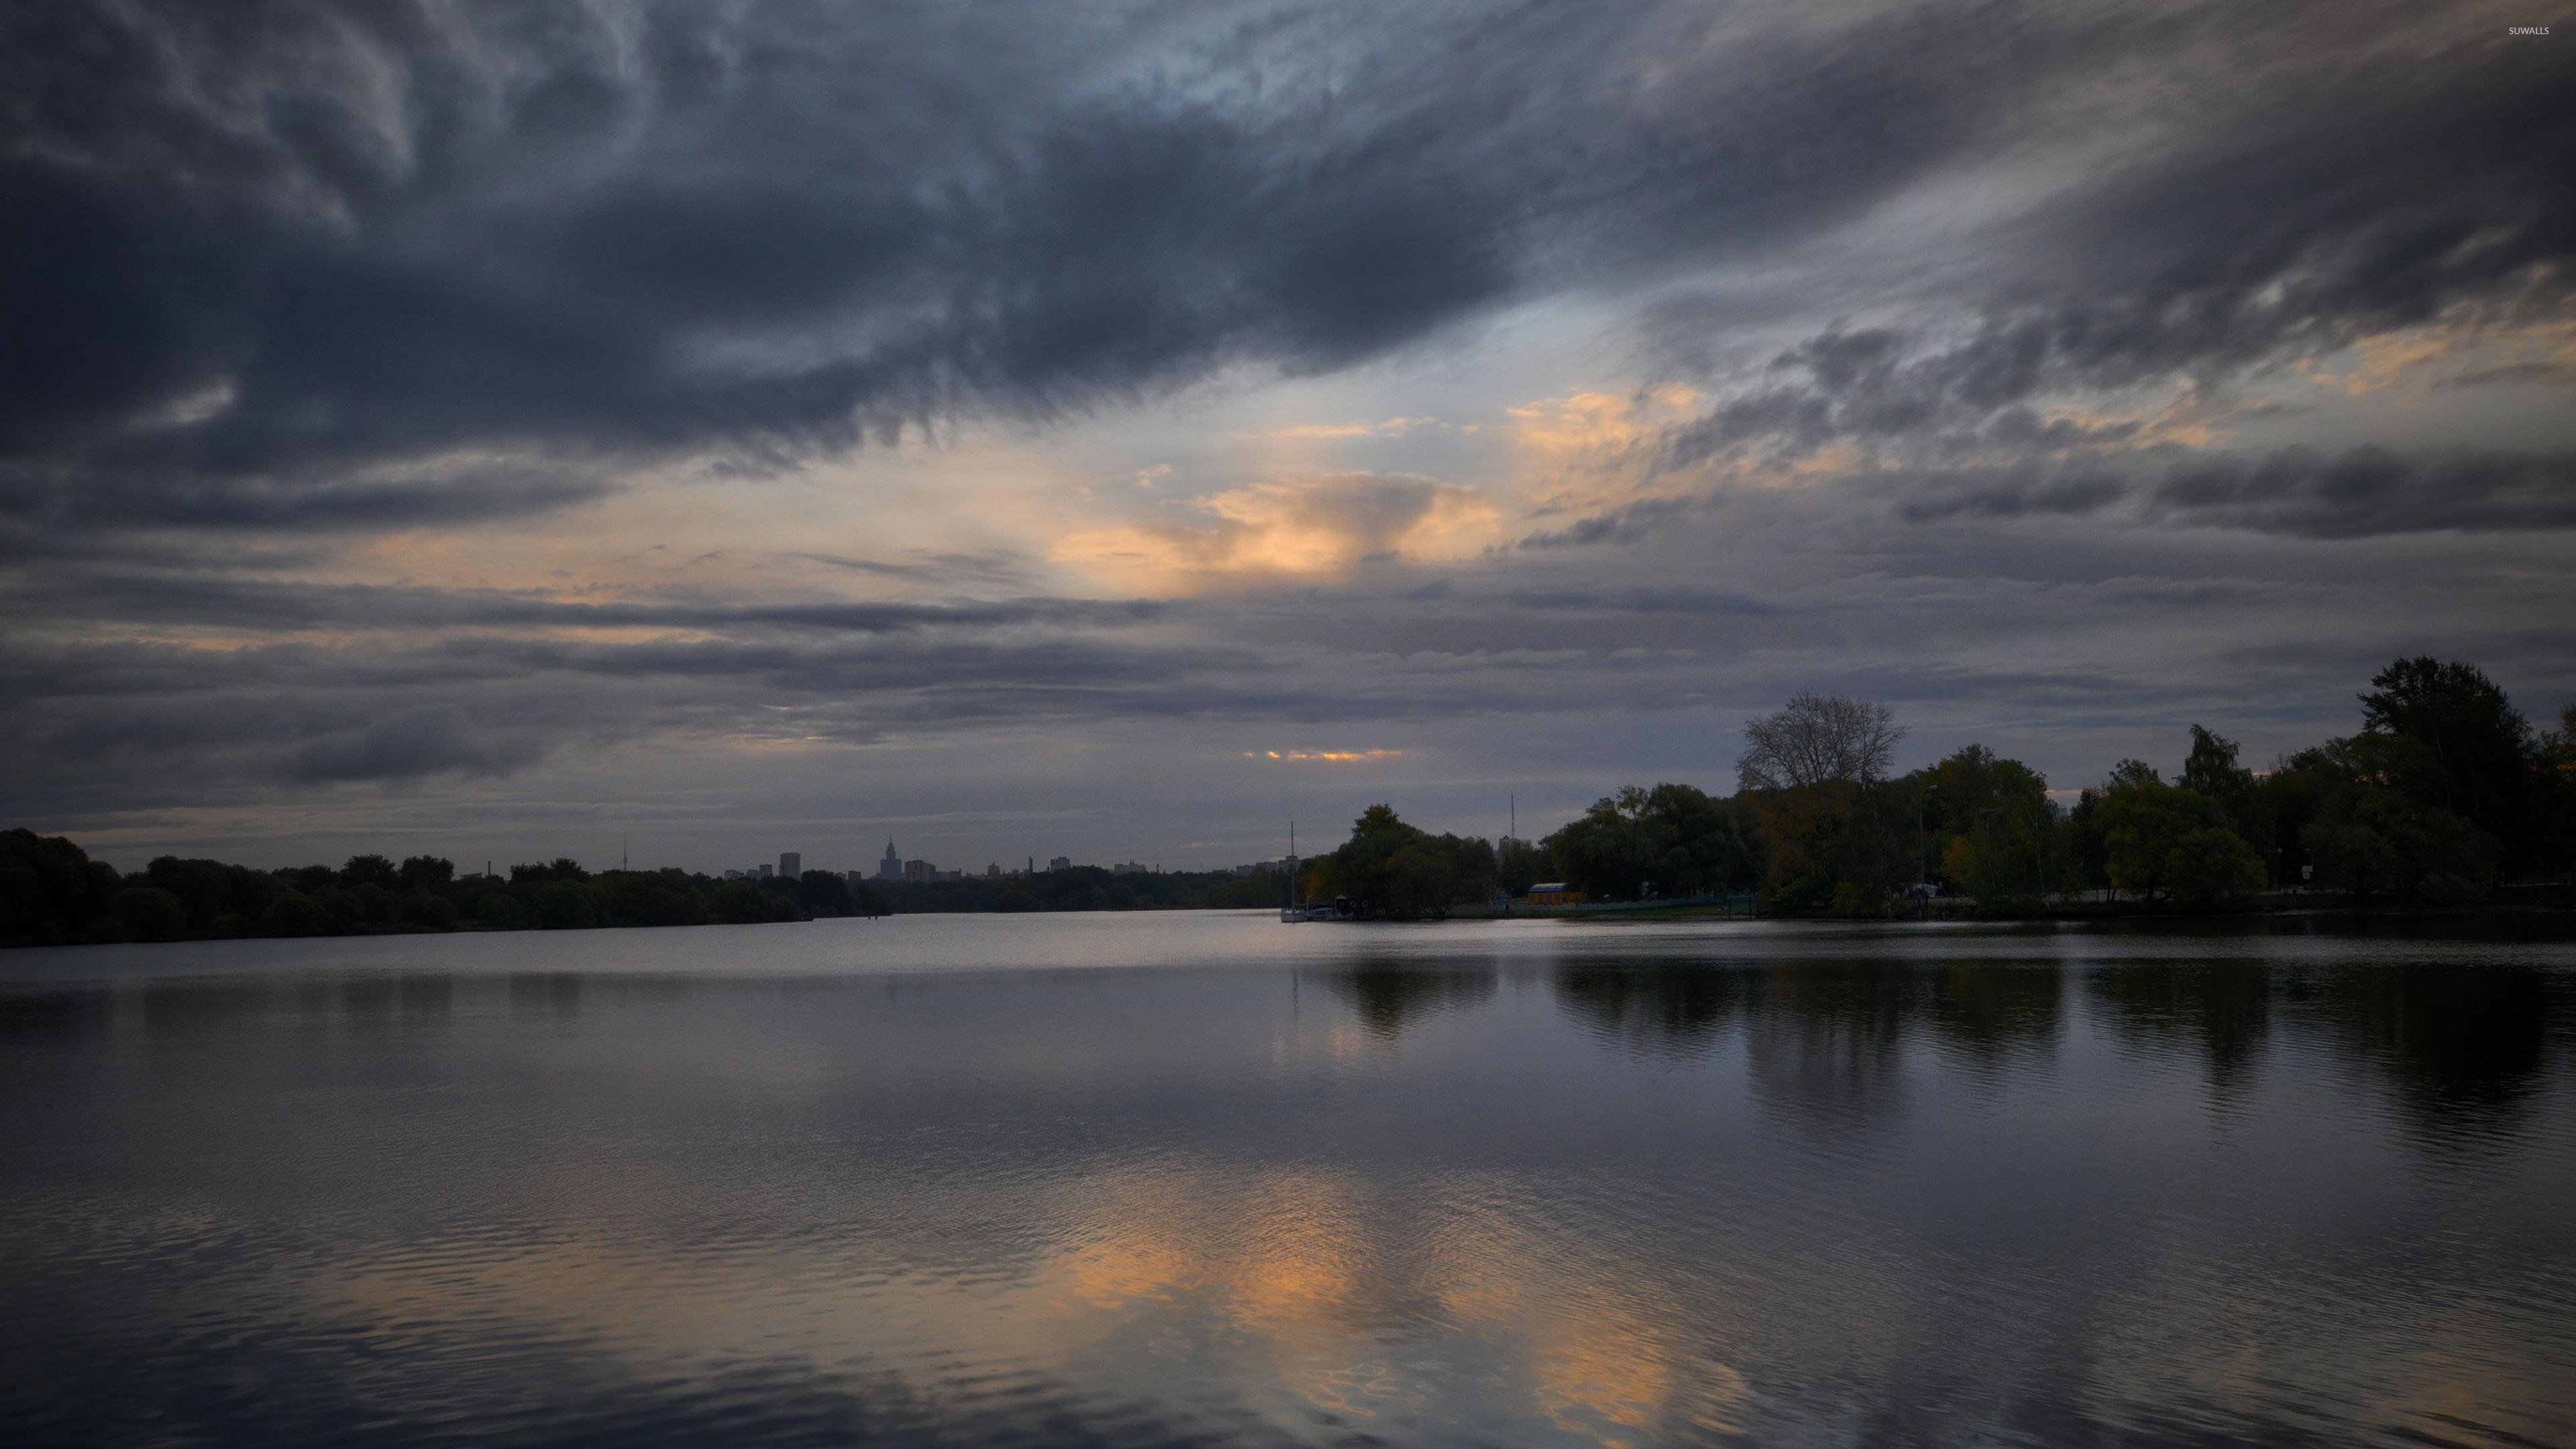 Dark Sky Above The Lake 2 Wallpaper Nature Wallpapers 38216